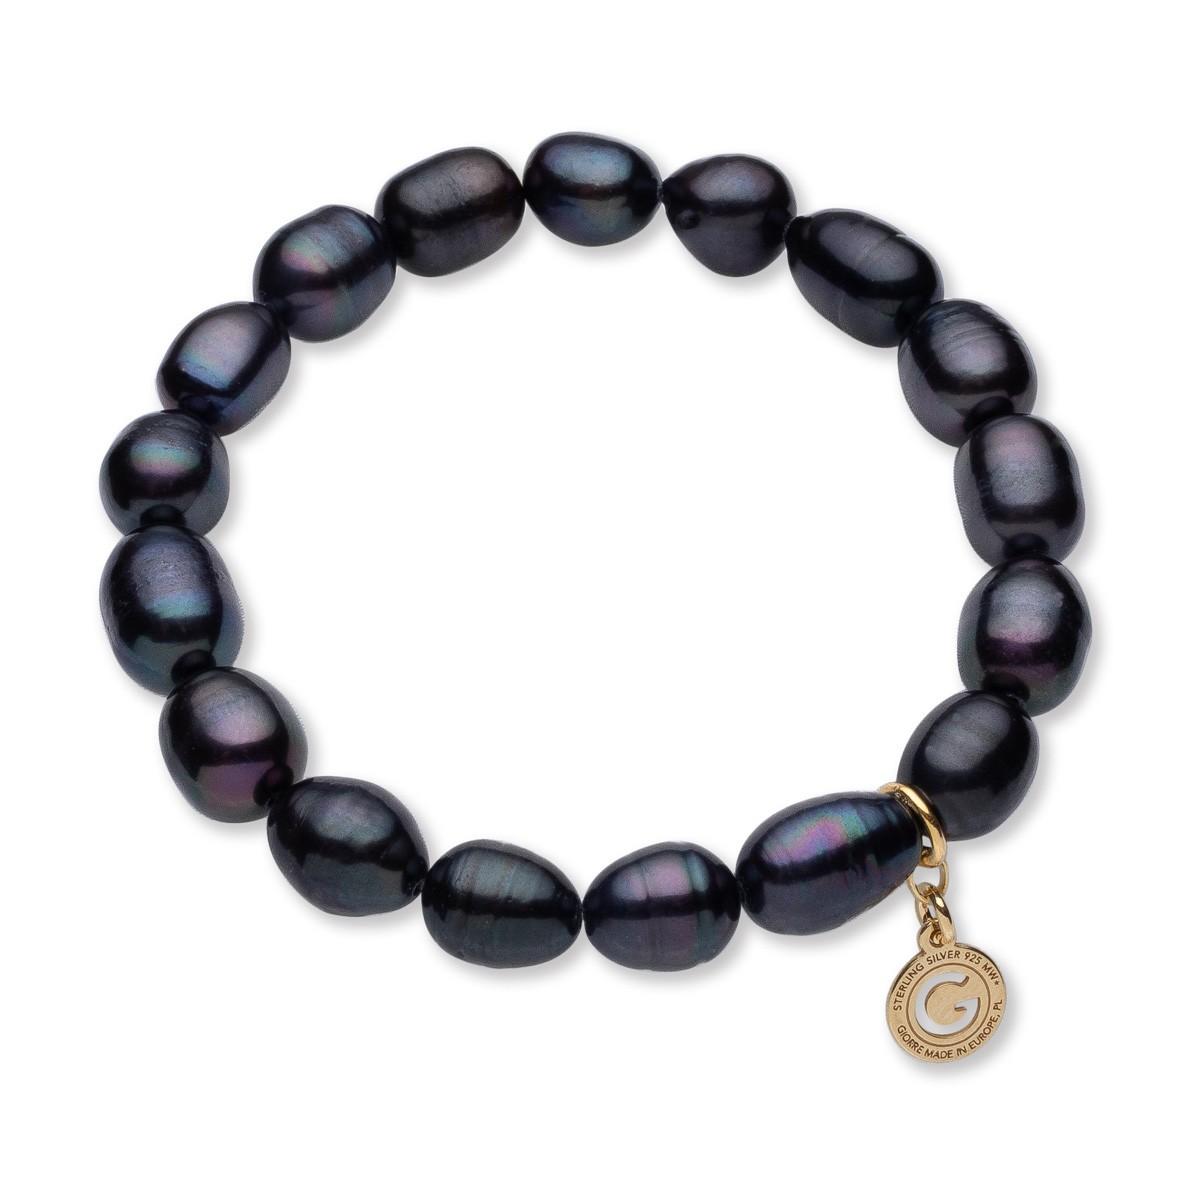 Elastyczna srebrna bransoletka ciemne perły słodkowodne, srebro 925